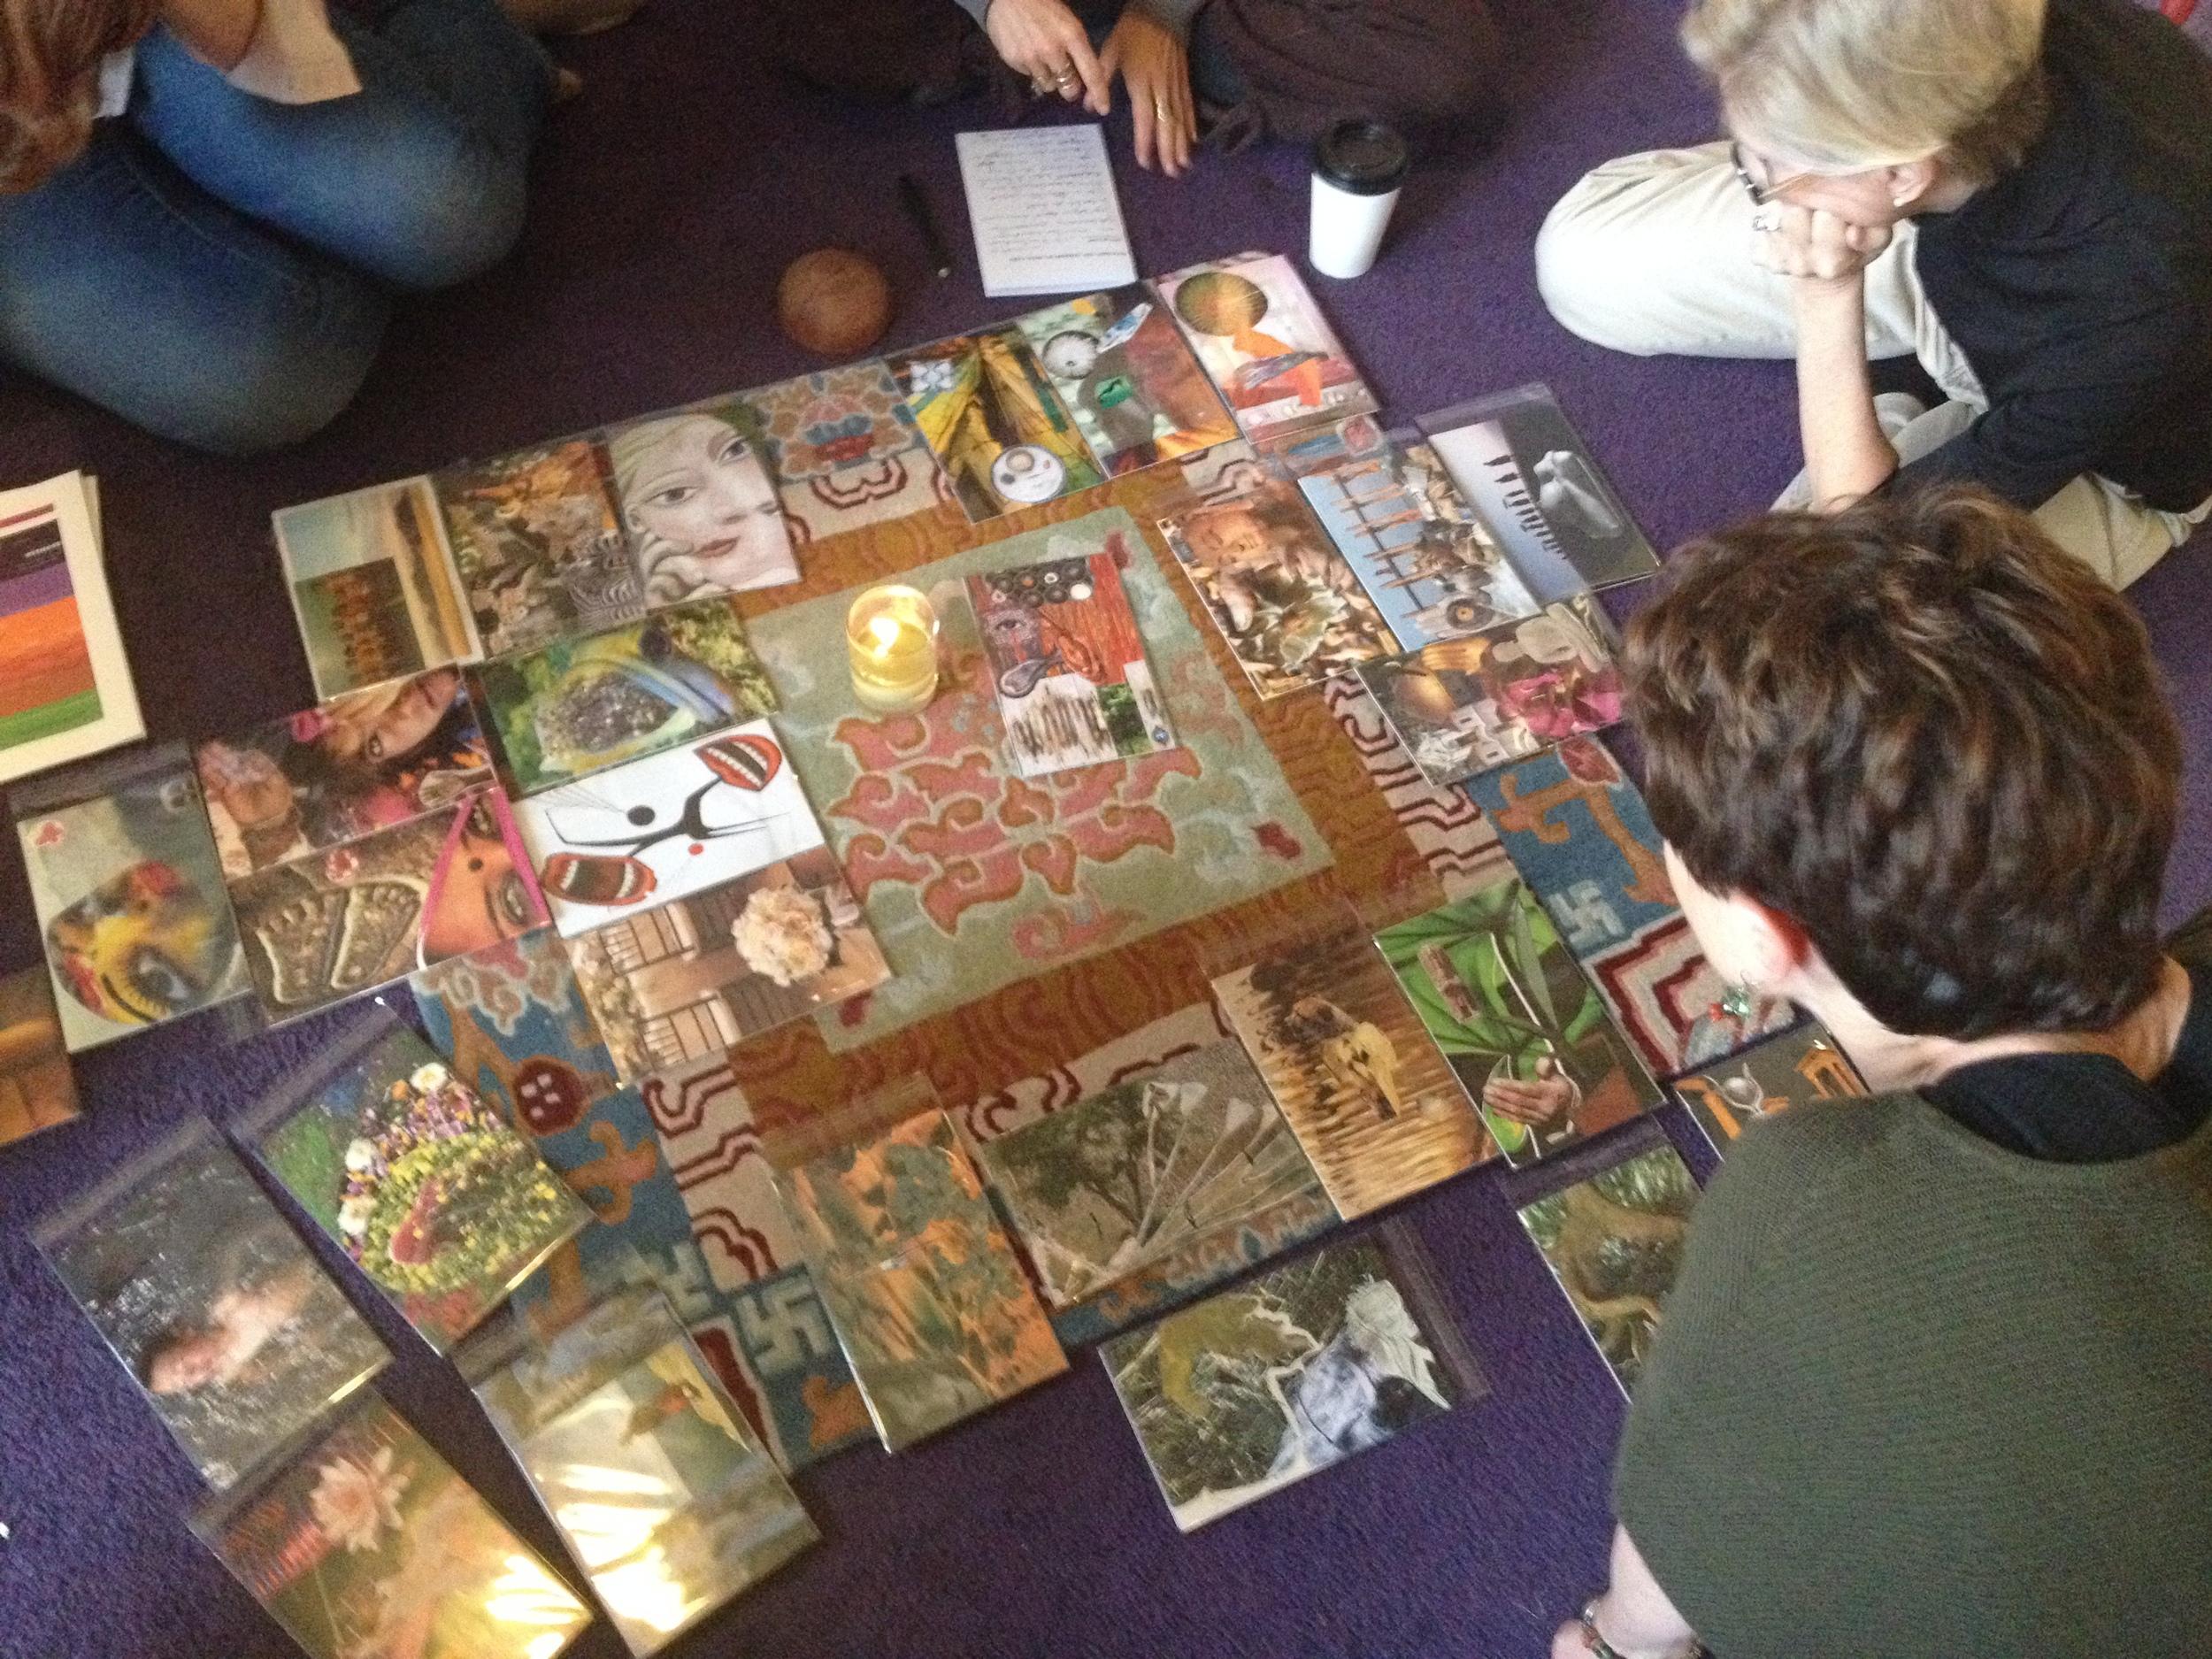 aileen-gural-soul-collage-nyc-workshops.jpg